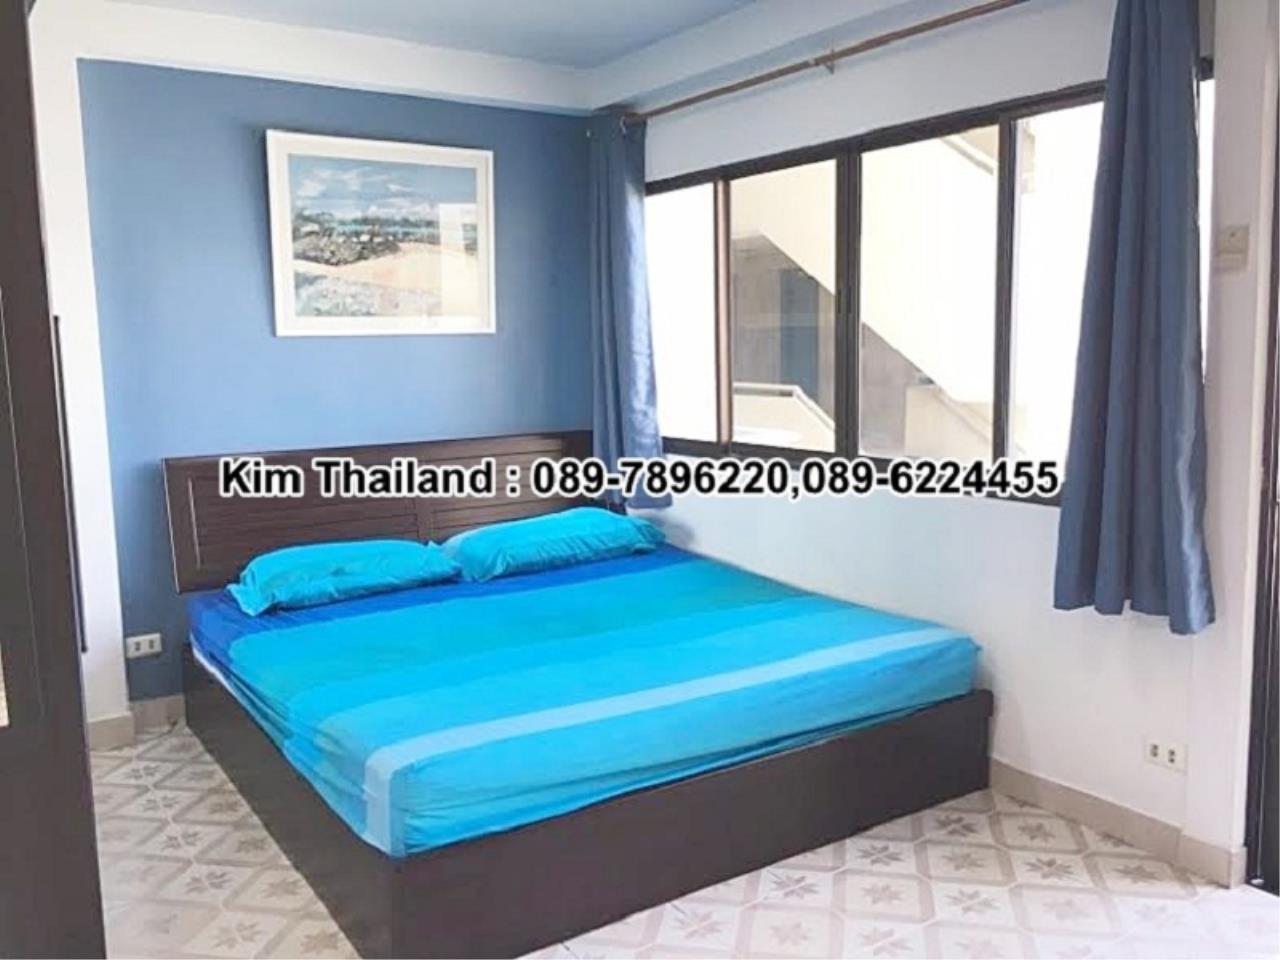 BKKcondorental Agency's For rent, Condo Saranjai Mansion. Area 35 sq.m. Studio. Rent 16,000baht/month 4